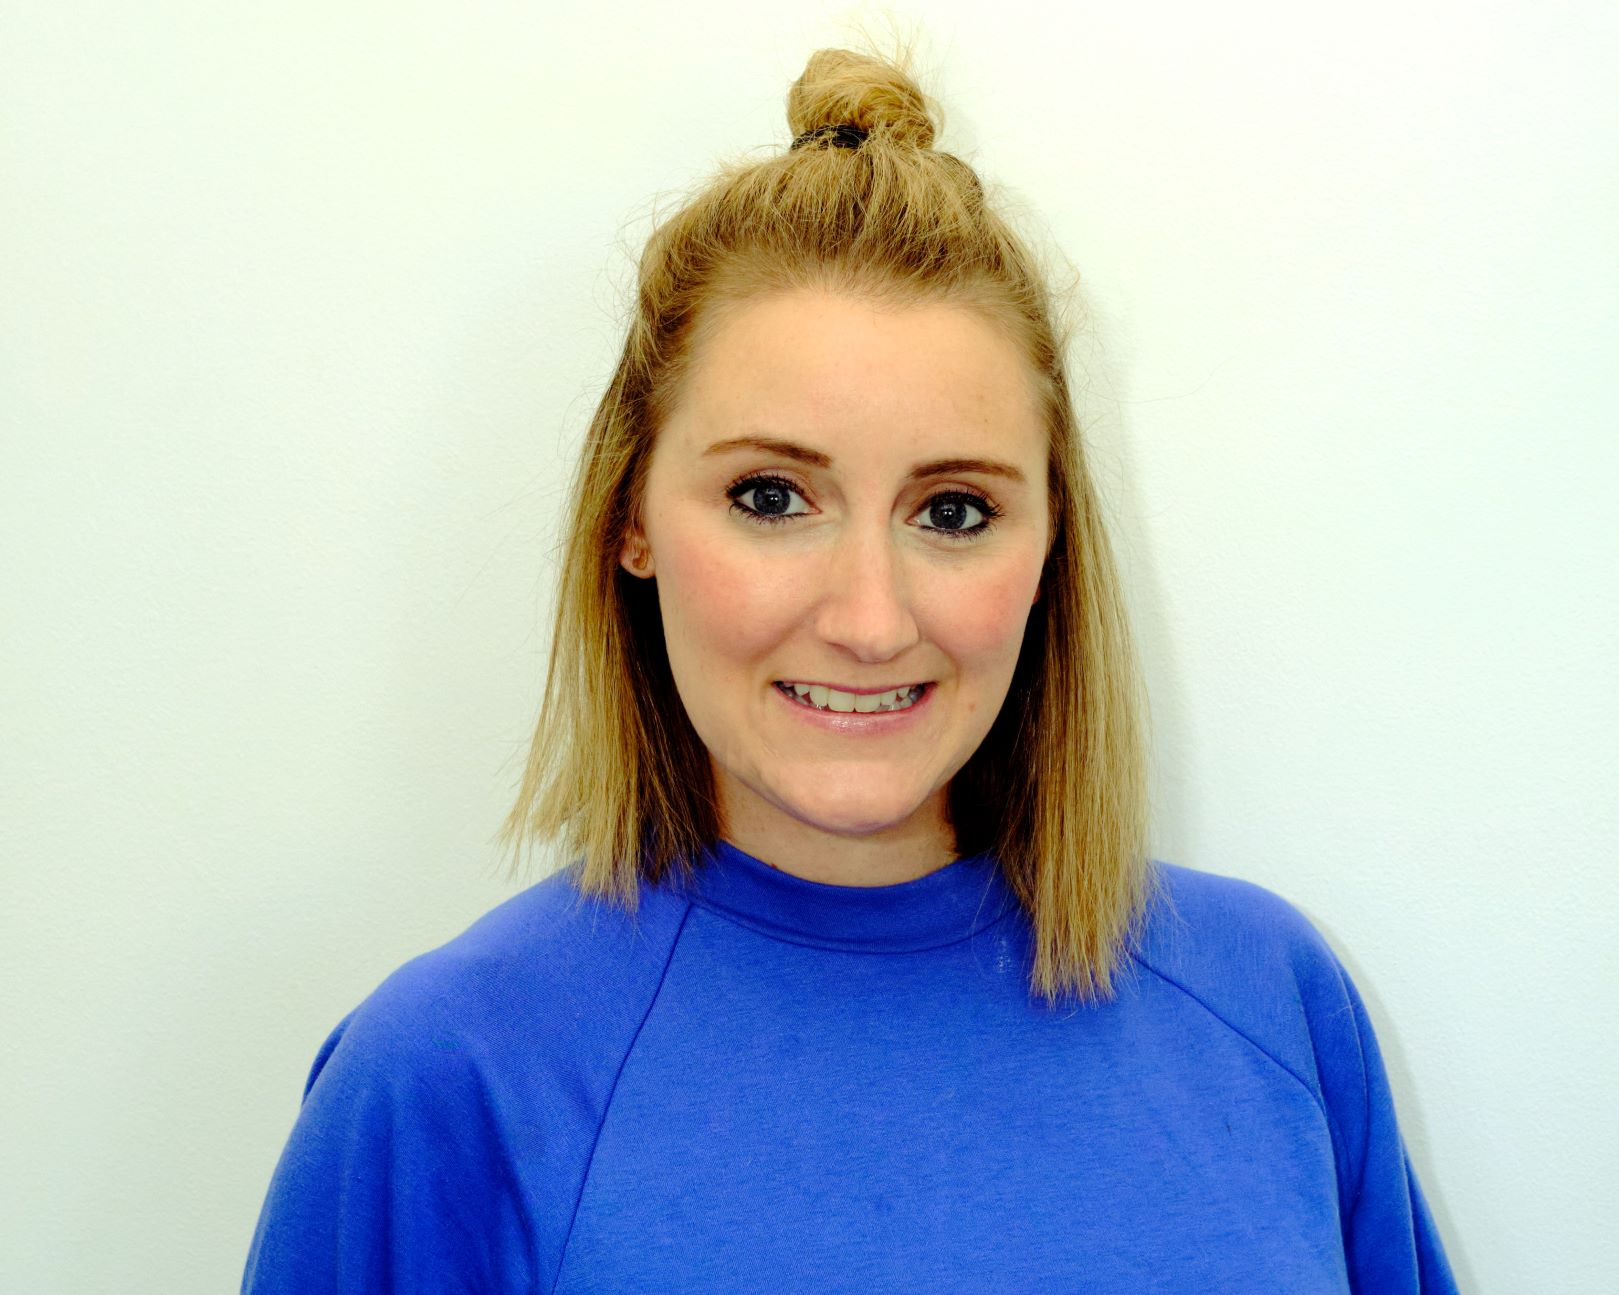 Meet Shelley Harrison our Senior Marketing Manager